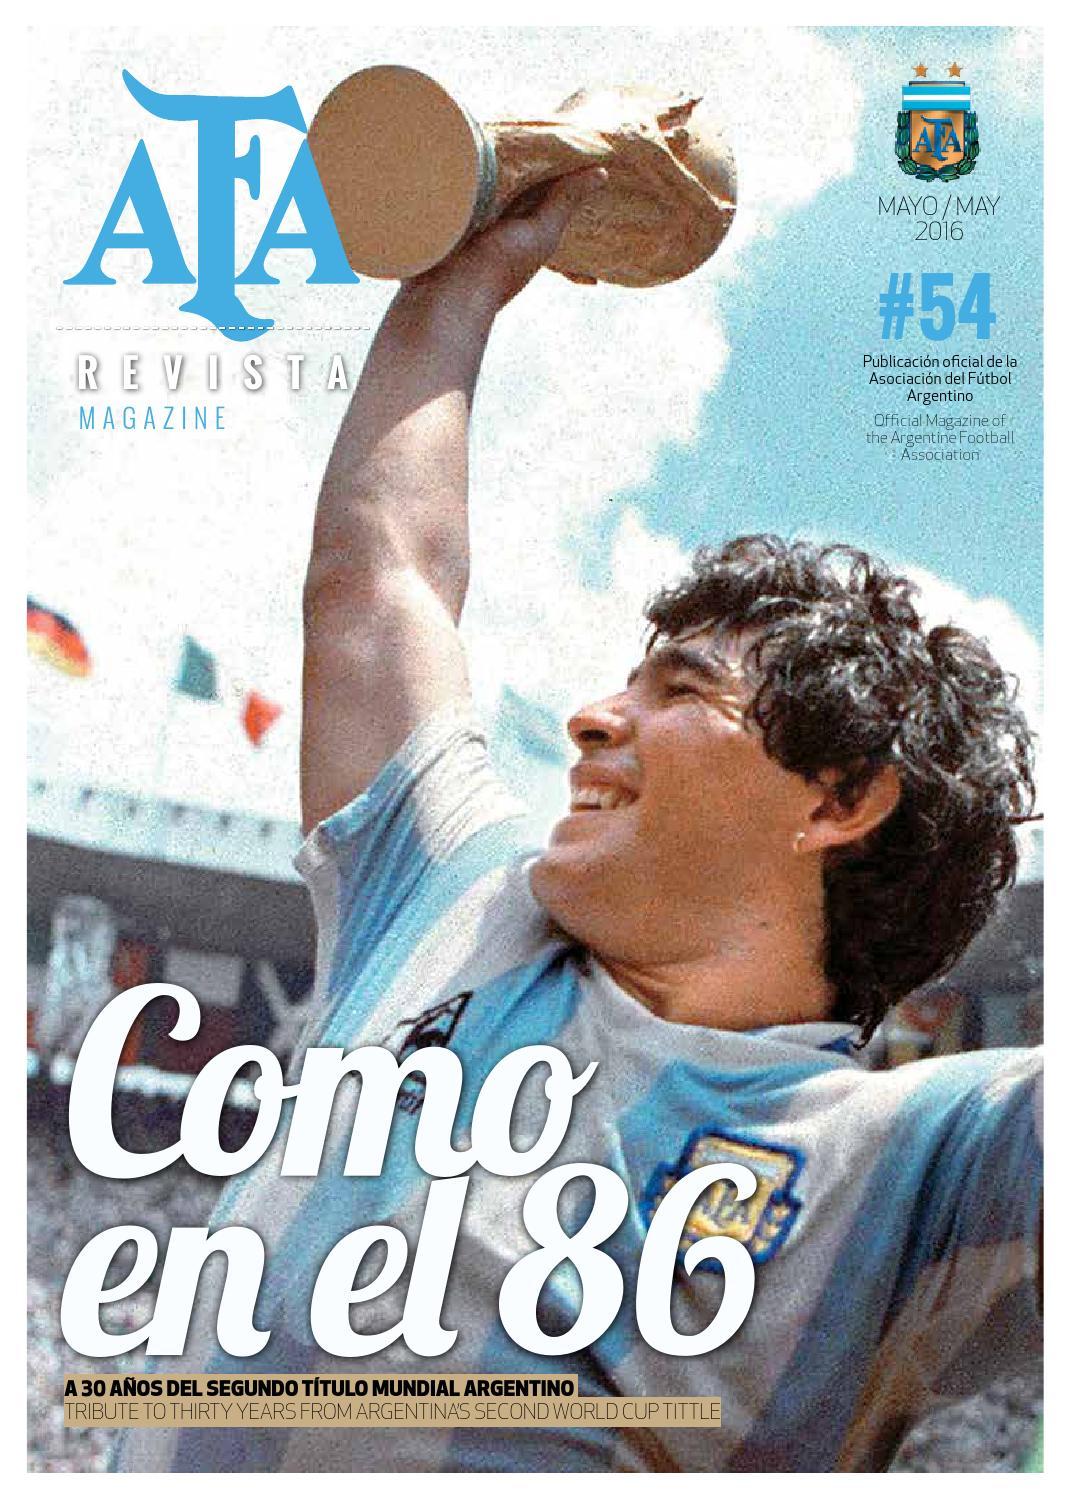 Afa revista 54 by afa asociaci n del f tbol argentino for Revistas del espectaculo argentino